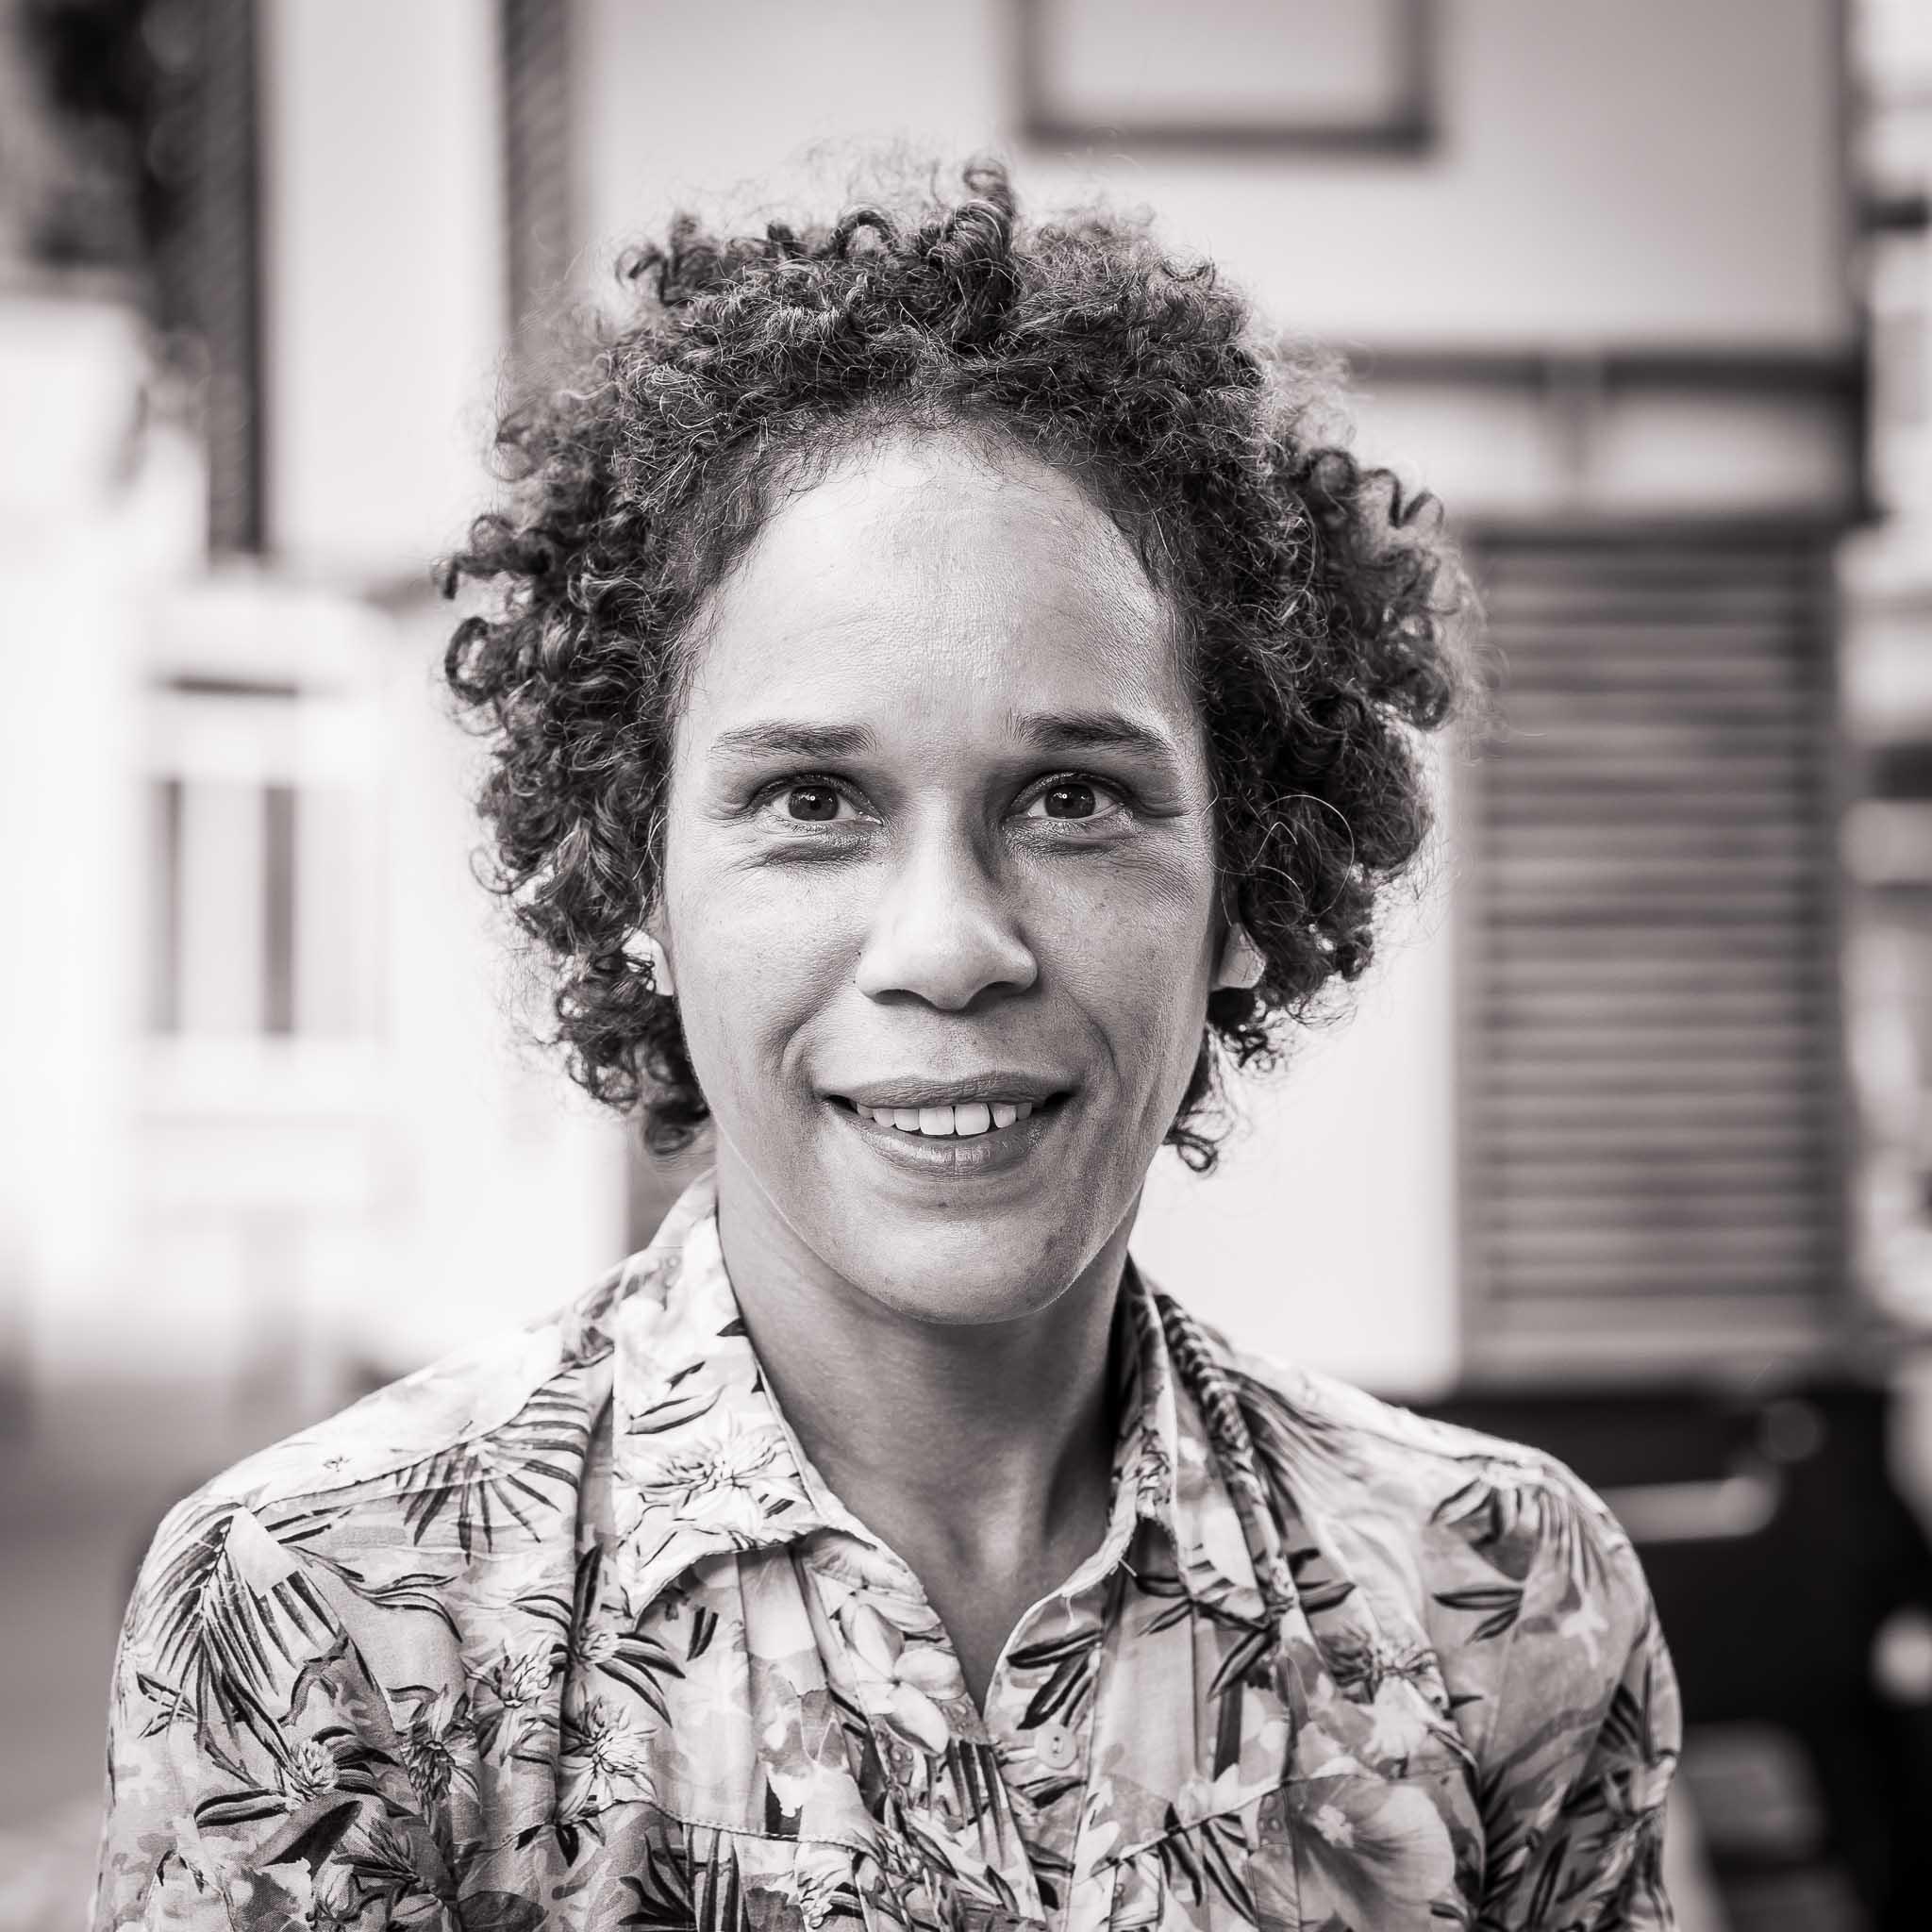 Porträt von Iyabo Kaczmarek